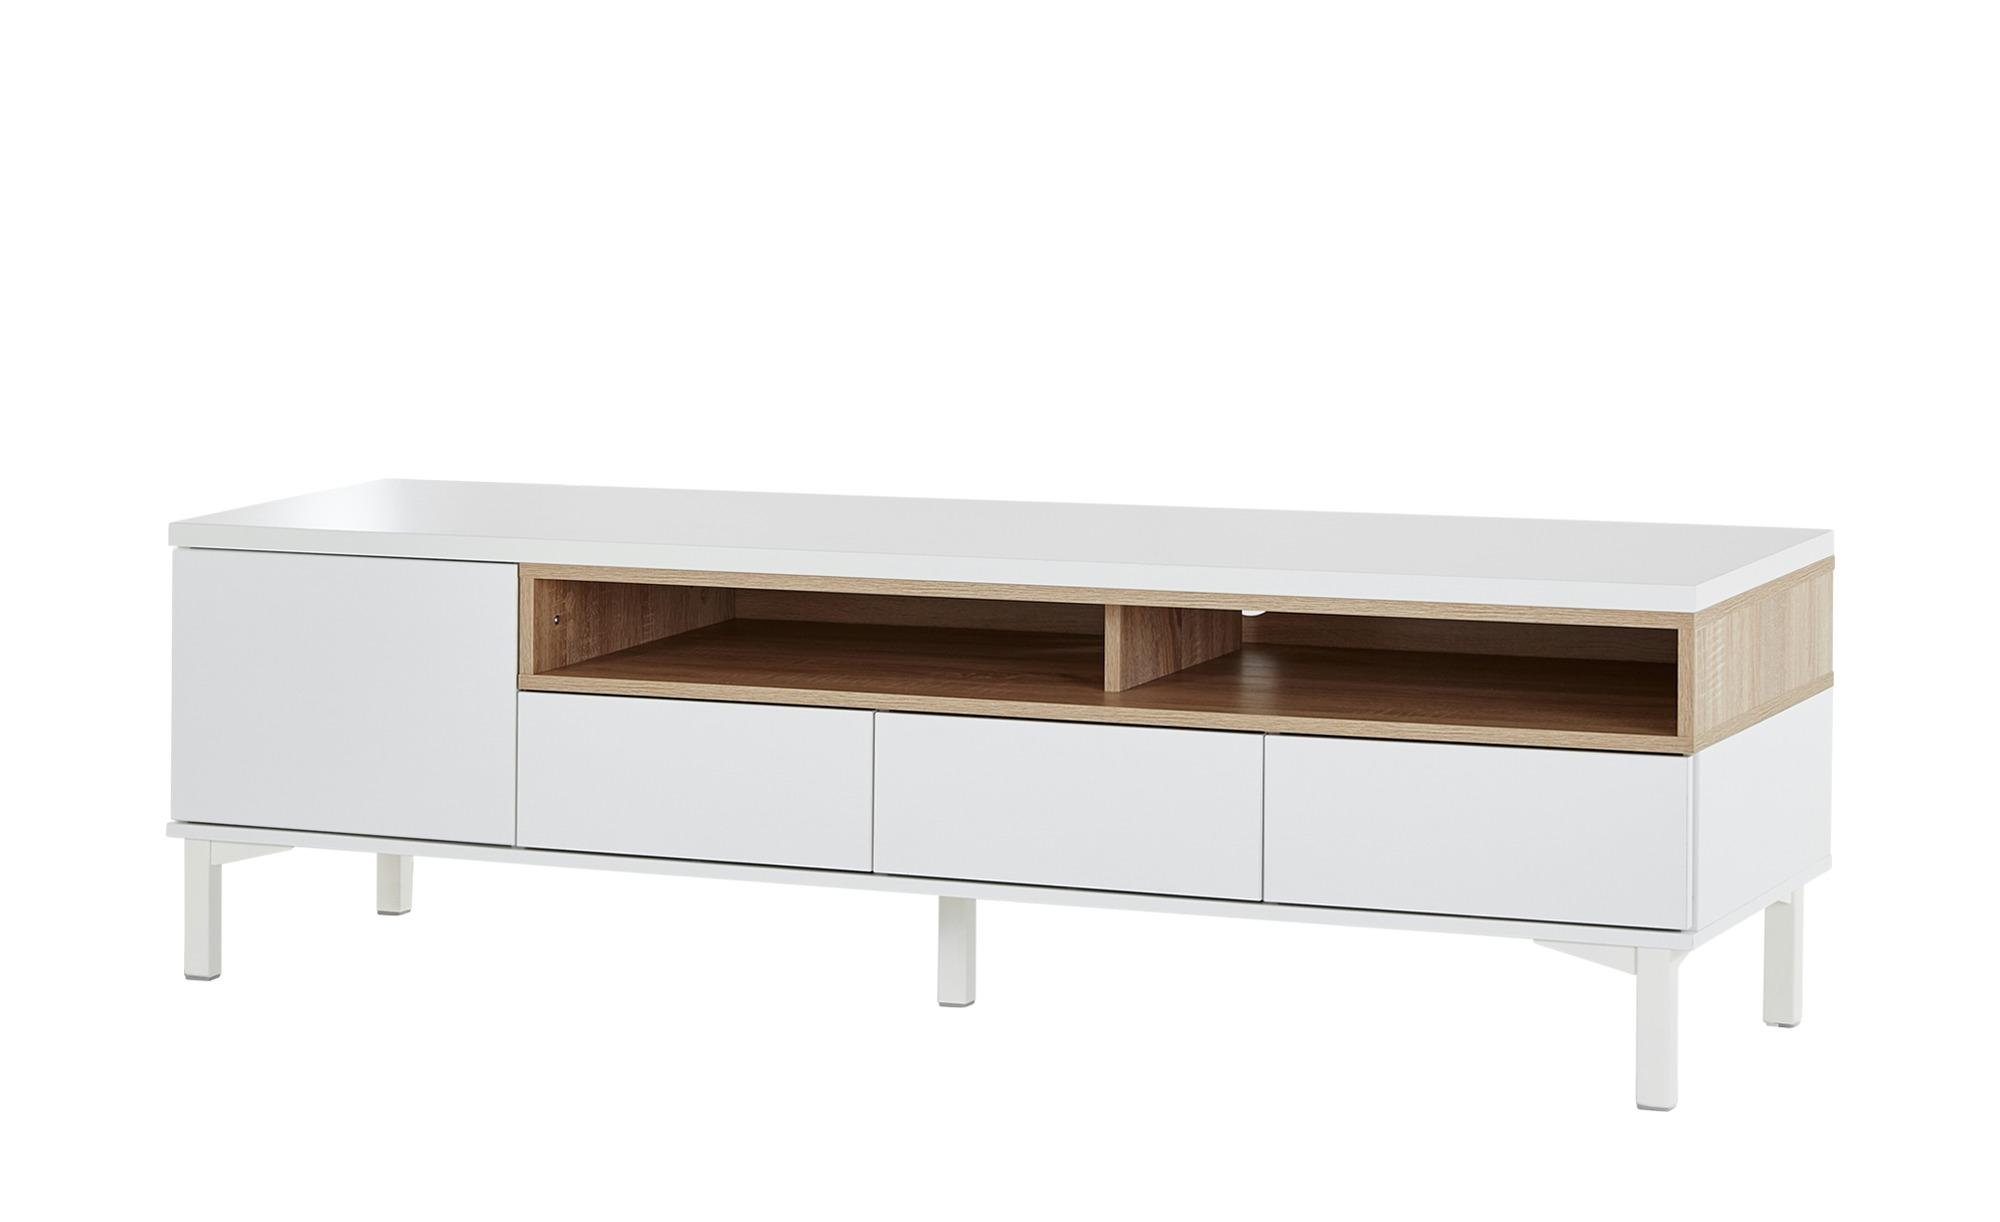 Roomers TV-Lowboard   Case ¦ weiß ¦ Maße (cm): B: 160 H: 47 T: 45 TV- & Media Möbel > TV-Racks - Höffner